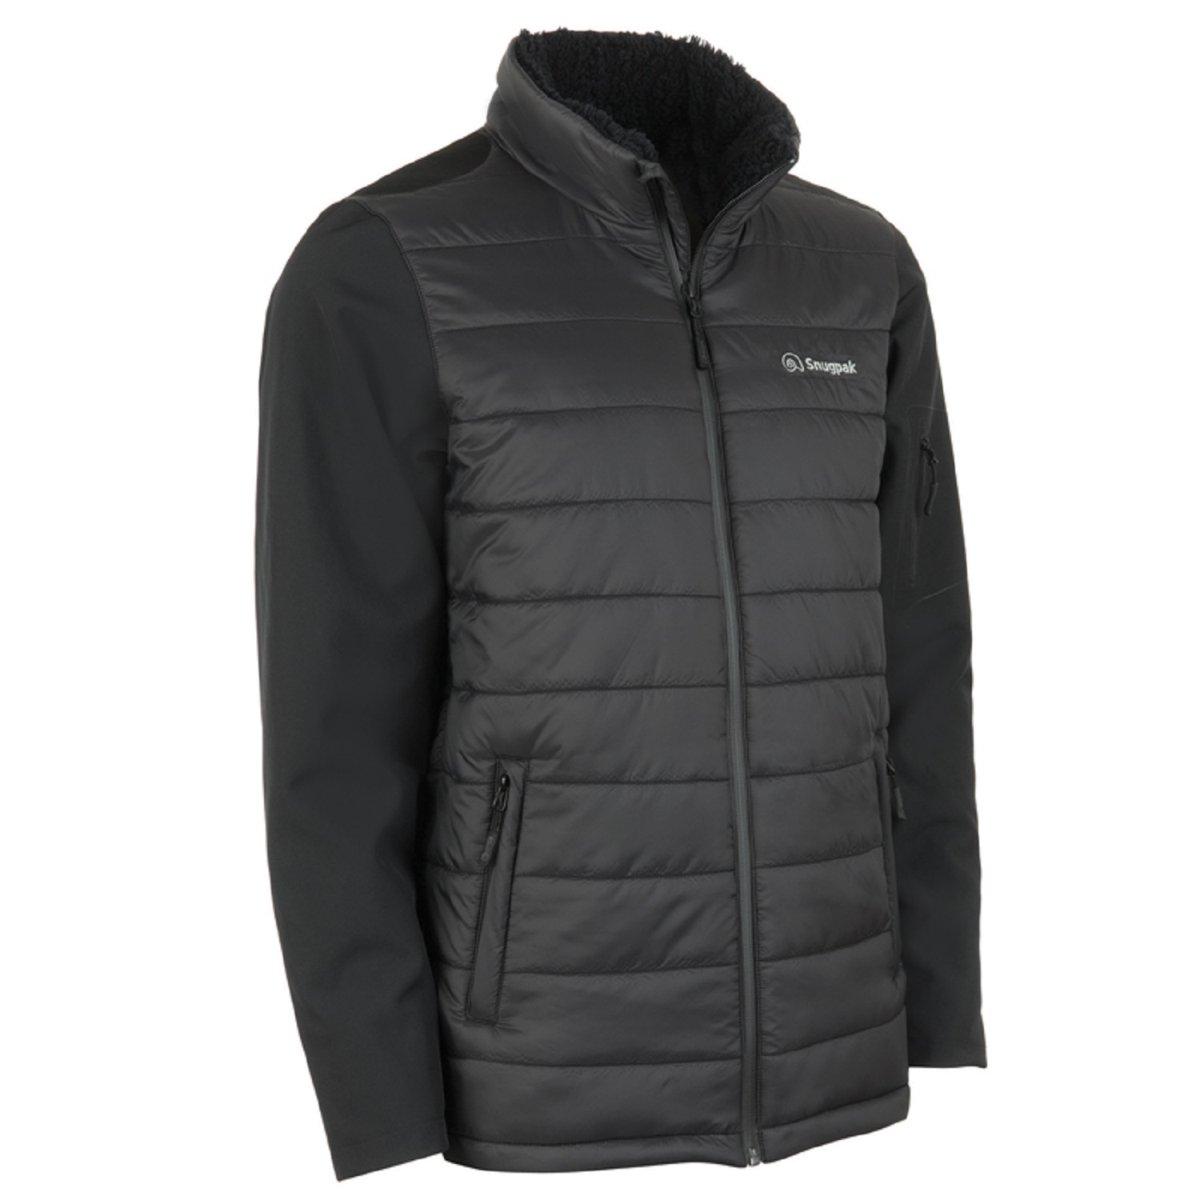 Snugpak - Fusion Insulated Jacket - Black - L